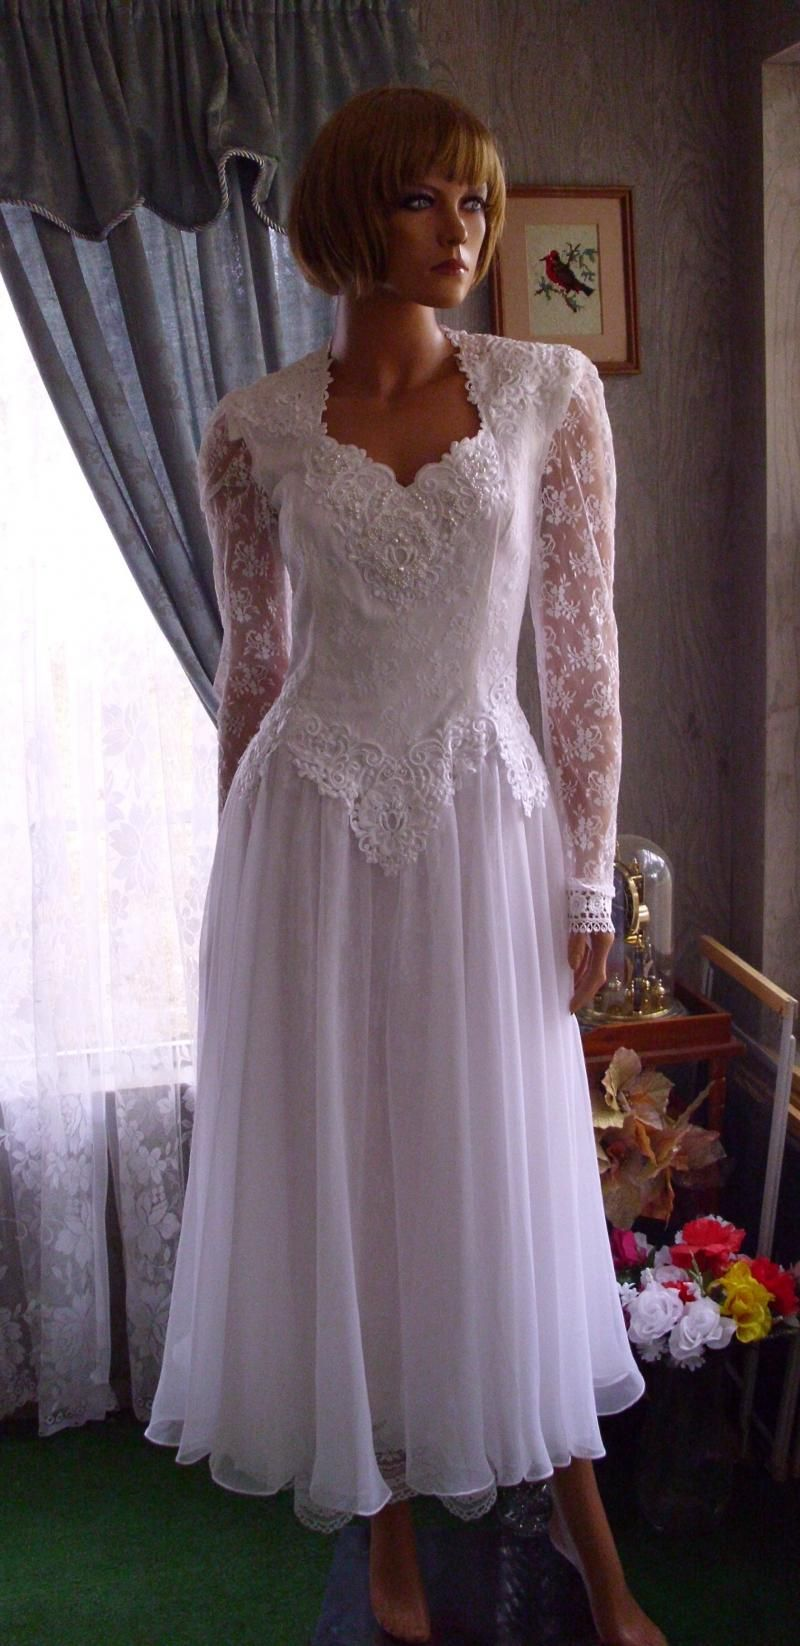 jessica mcclintock gunne sax dress | Exquisite Gunne Sax Jessica ...